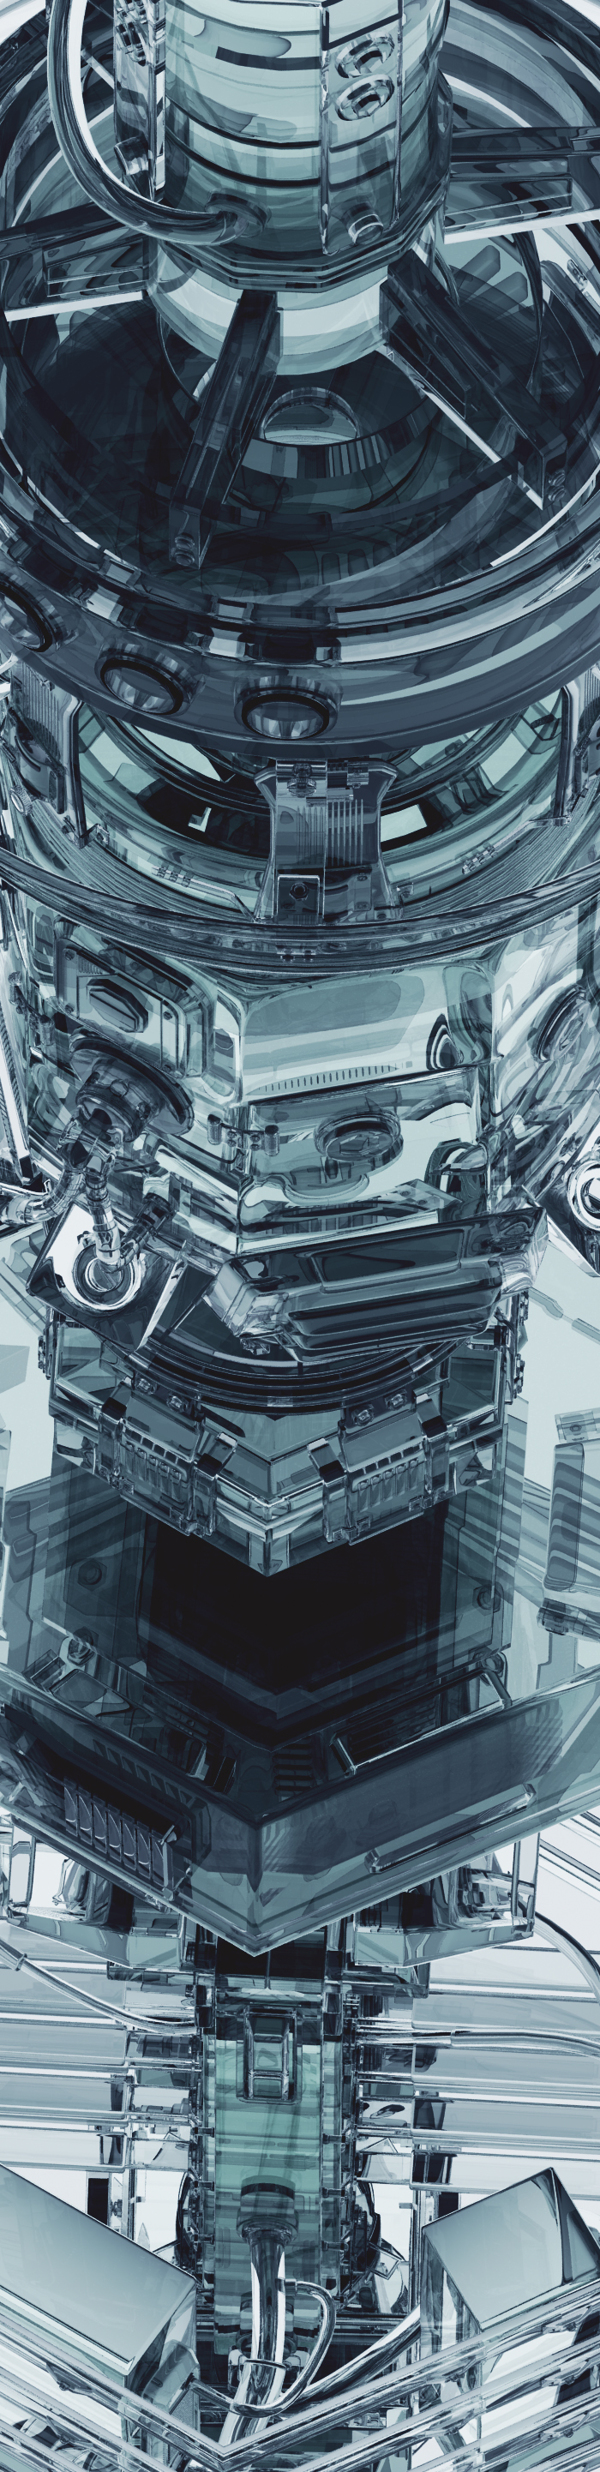 the_tree_mag-transparent-machines-by-mike-winkelmann-beeple-80.jpg